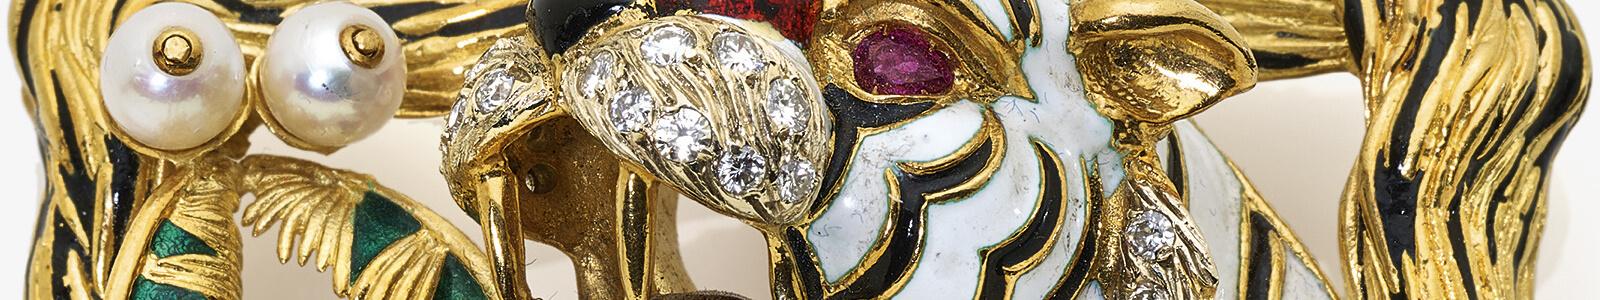 Jewelery auction